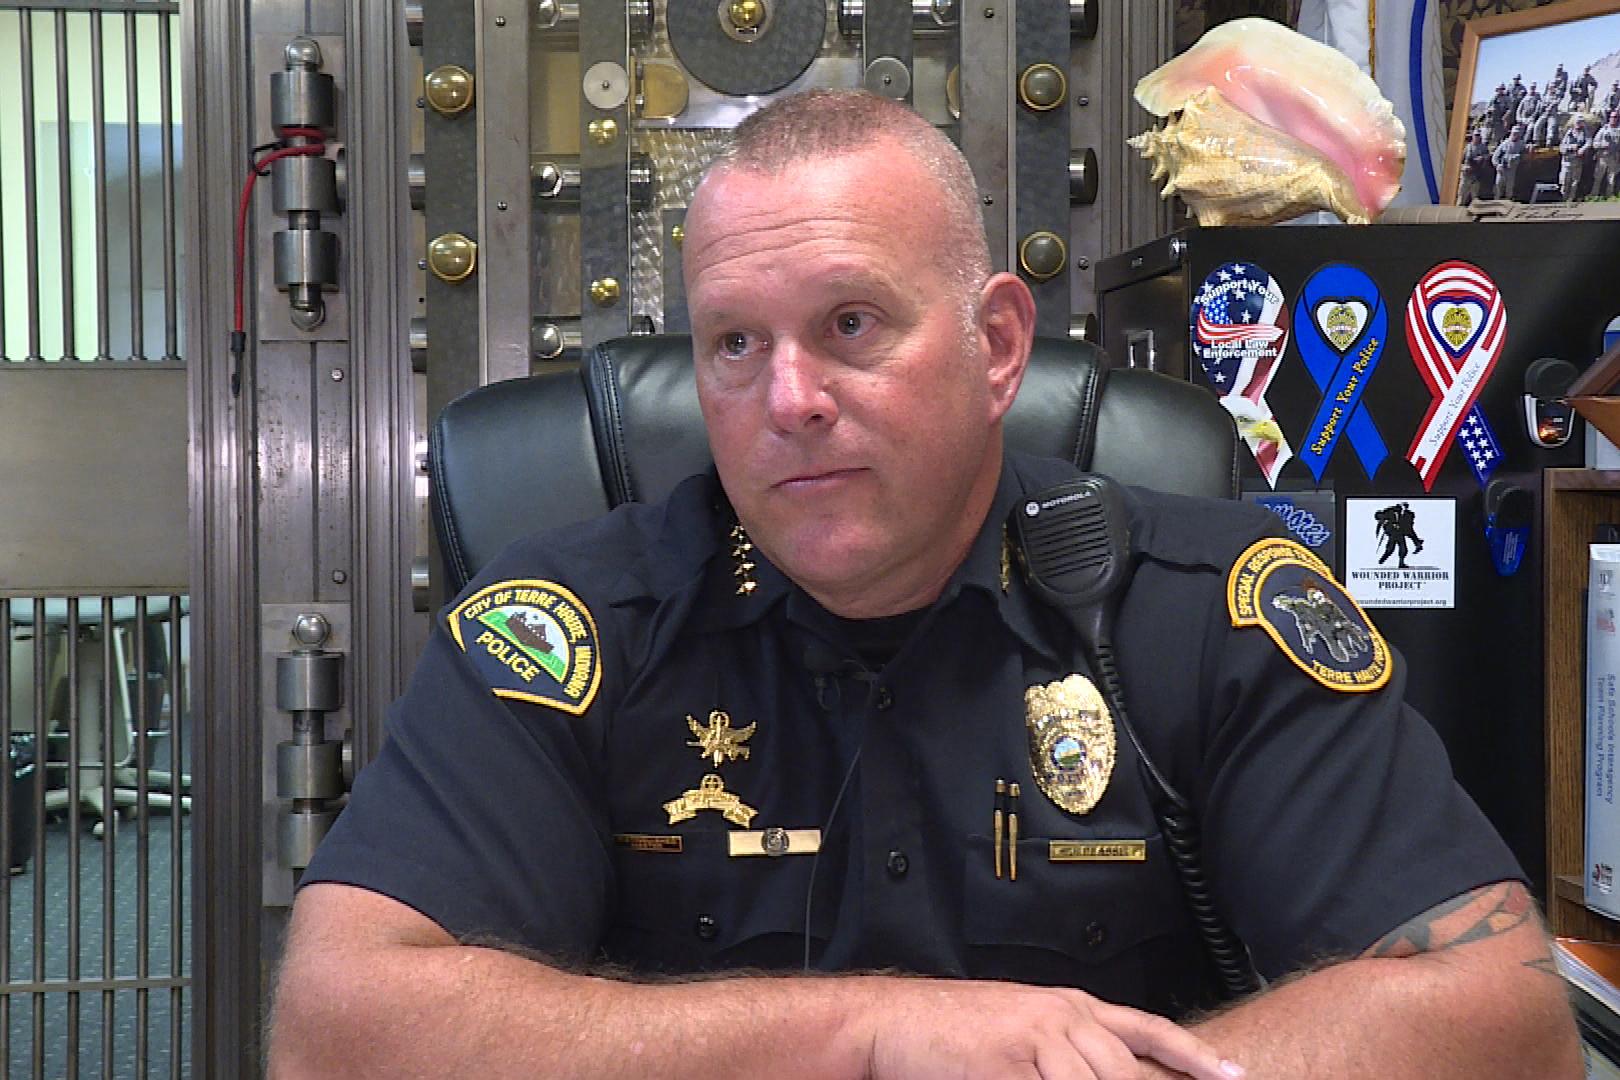 Terre Haute Chief of Police John Plasse at his desk in the Terre Haute Police Department.